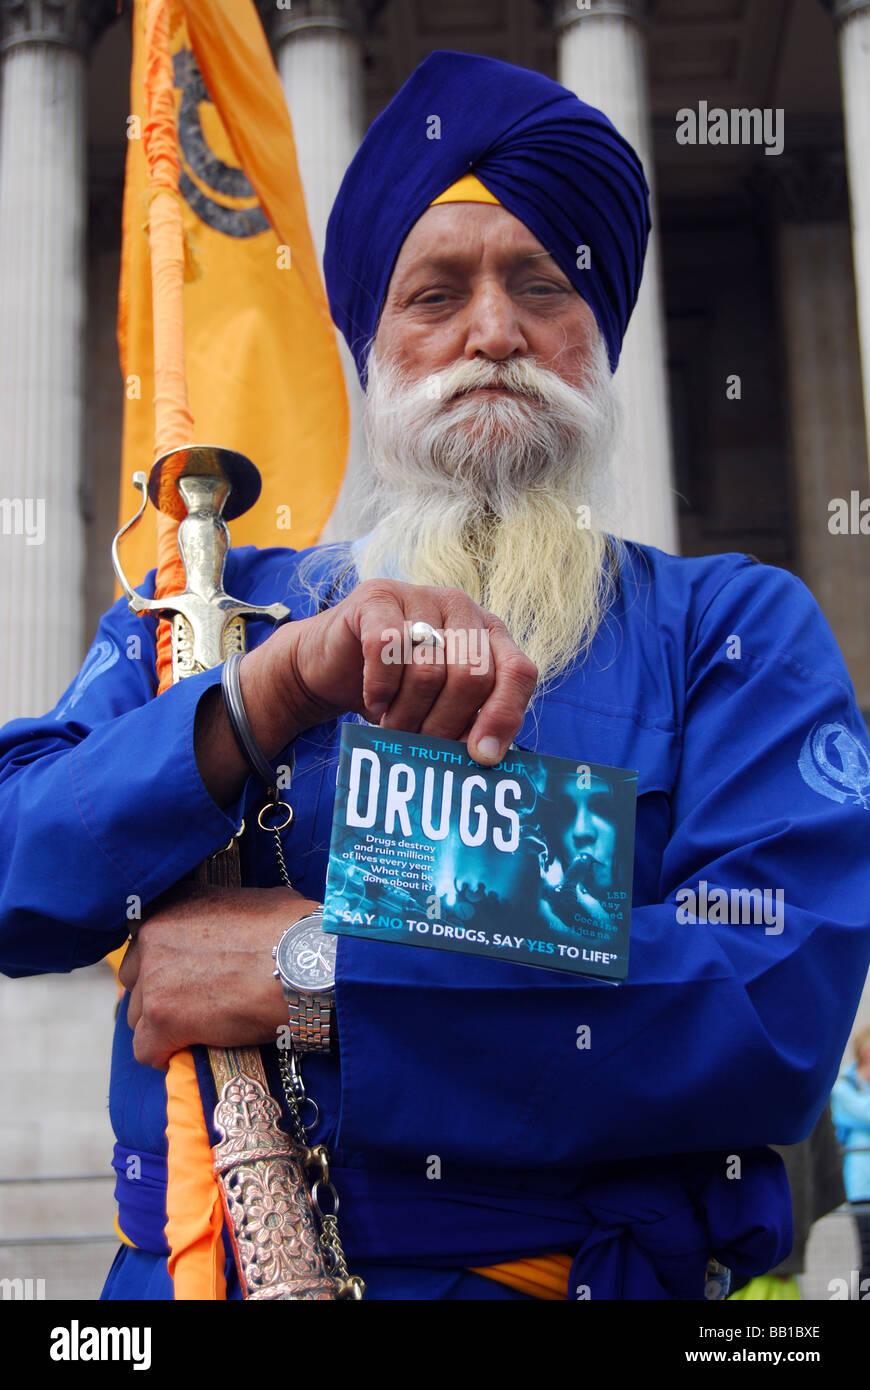 Sikh man turban sword beard proud anti drugs - Stock Image